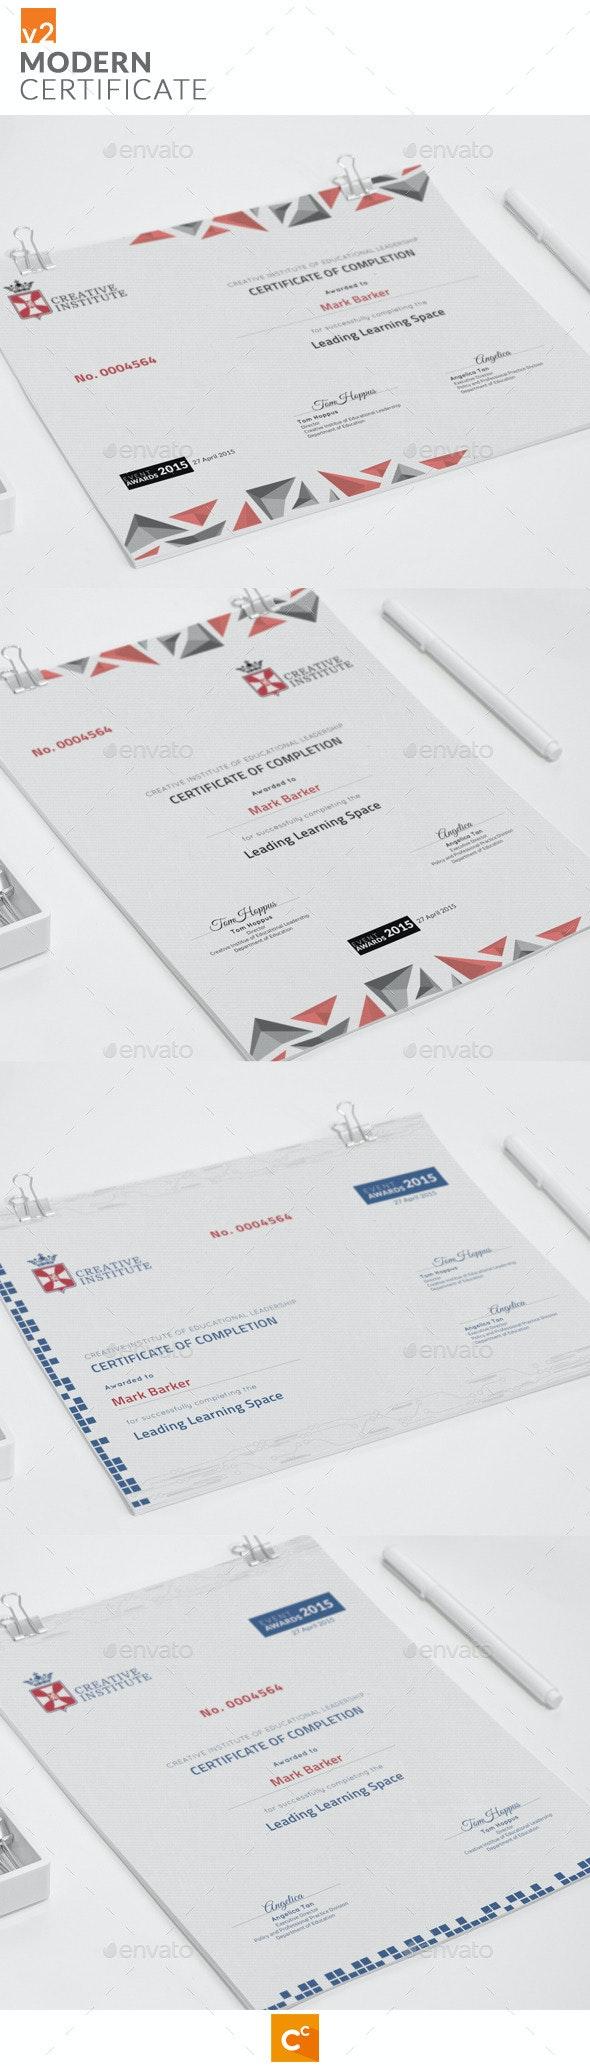 Modern Certificate v2 - Certificates Stationery